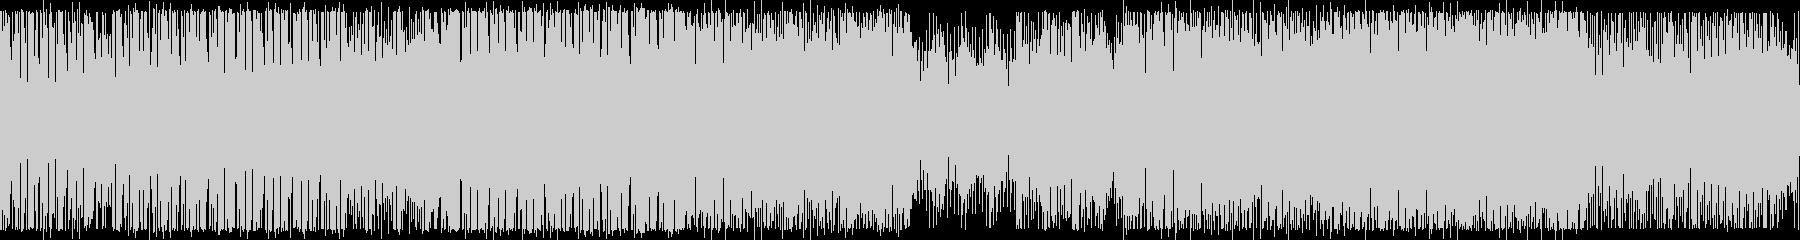 BPM160:ワークアウト:ループ版の未再生の波形